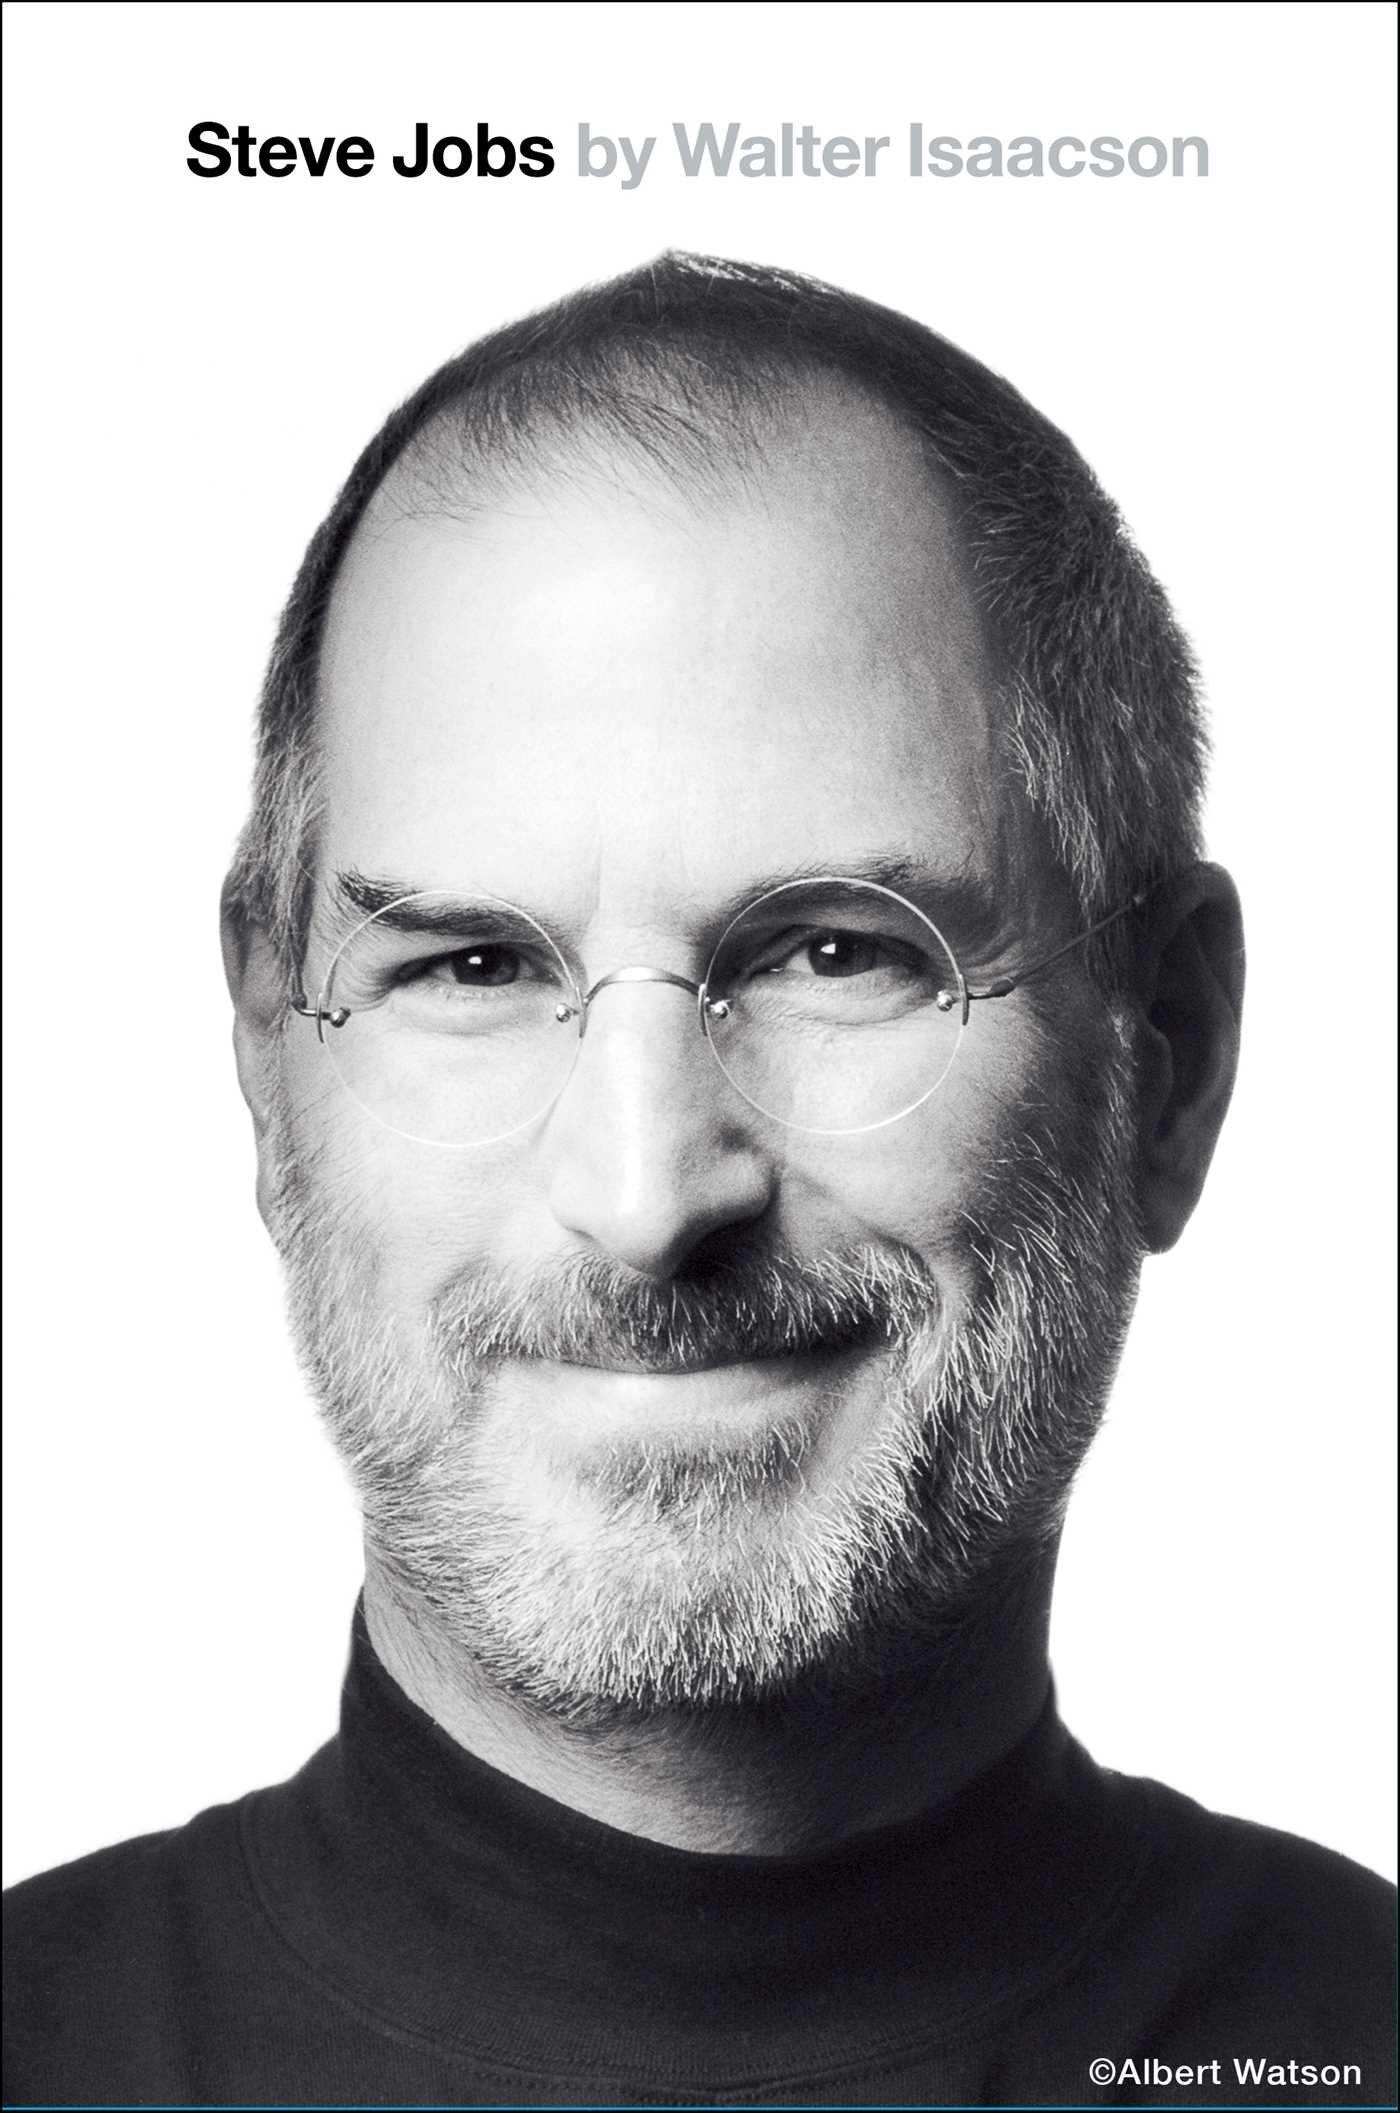 Steve Jobs by Walter Isaacson — Summary